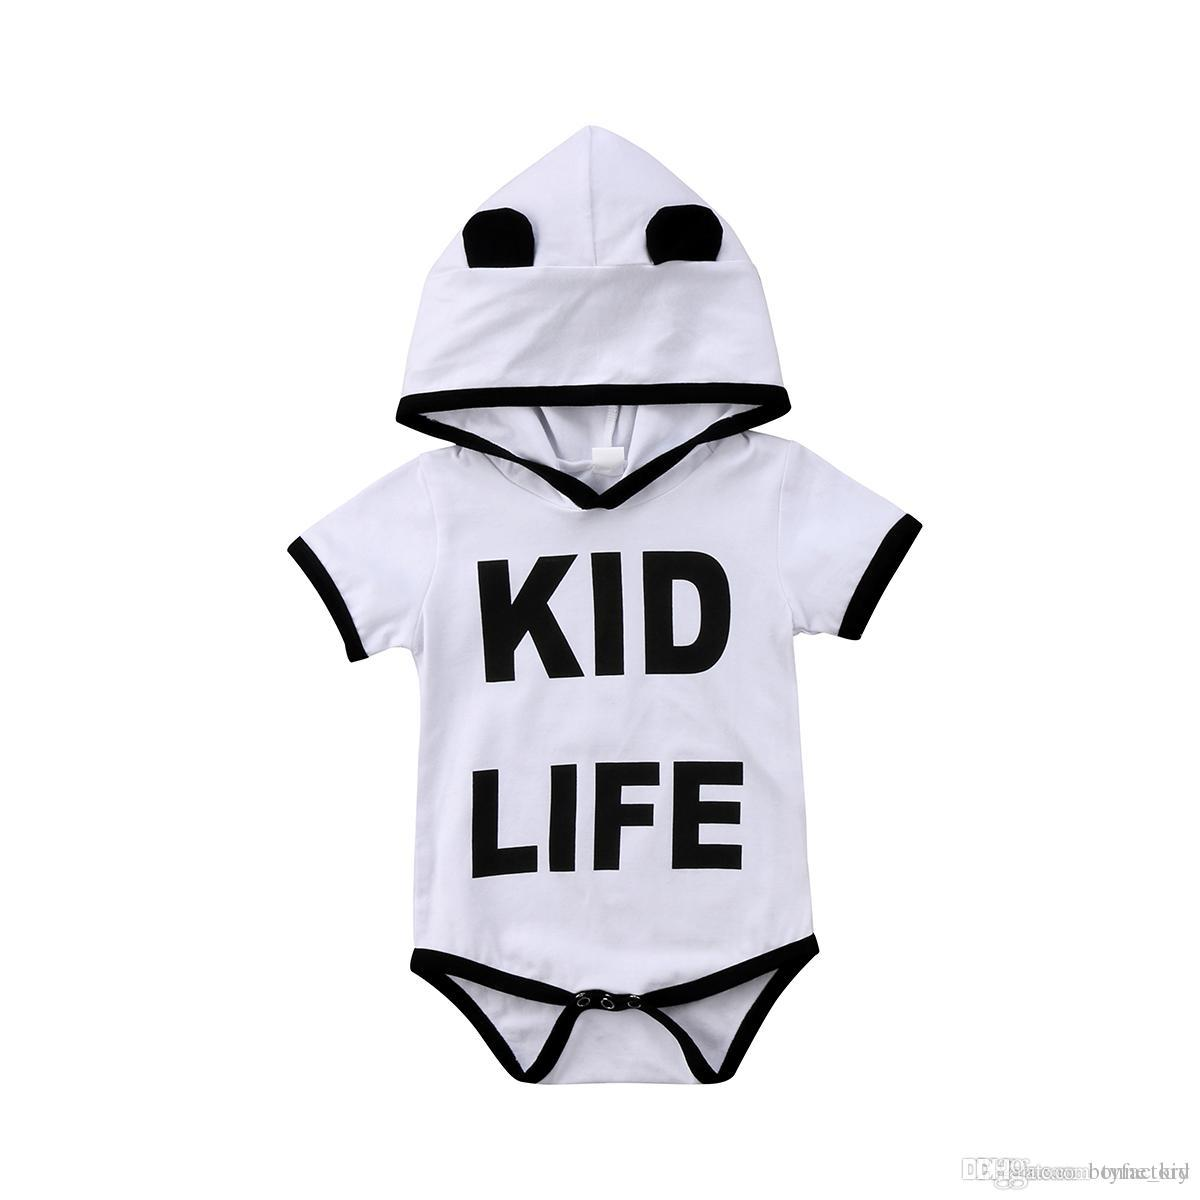 Infant baby girl boy clothes hooded romper onesies letter print jumpsuit kid clothing child adorable bodysuit sunsuit playsuit toddler